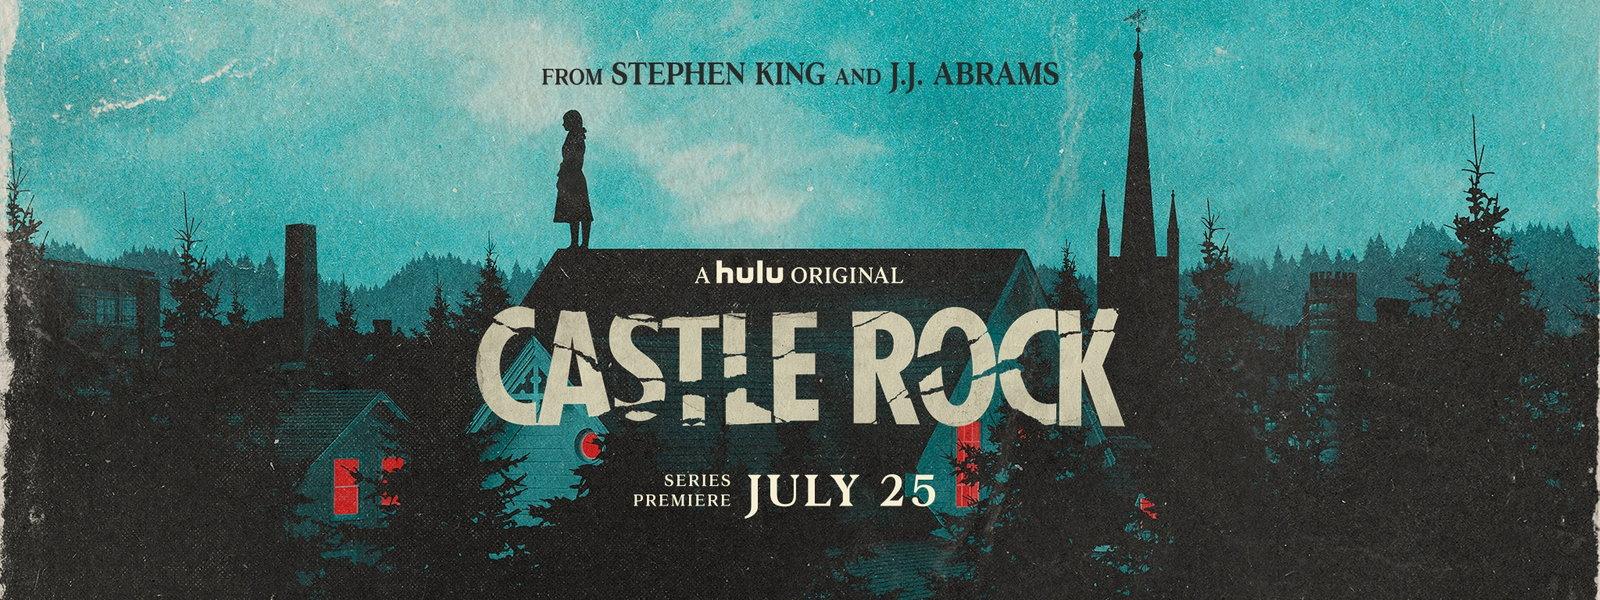 Castle Rock poster header.jpg